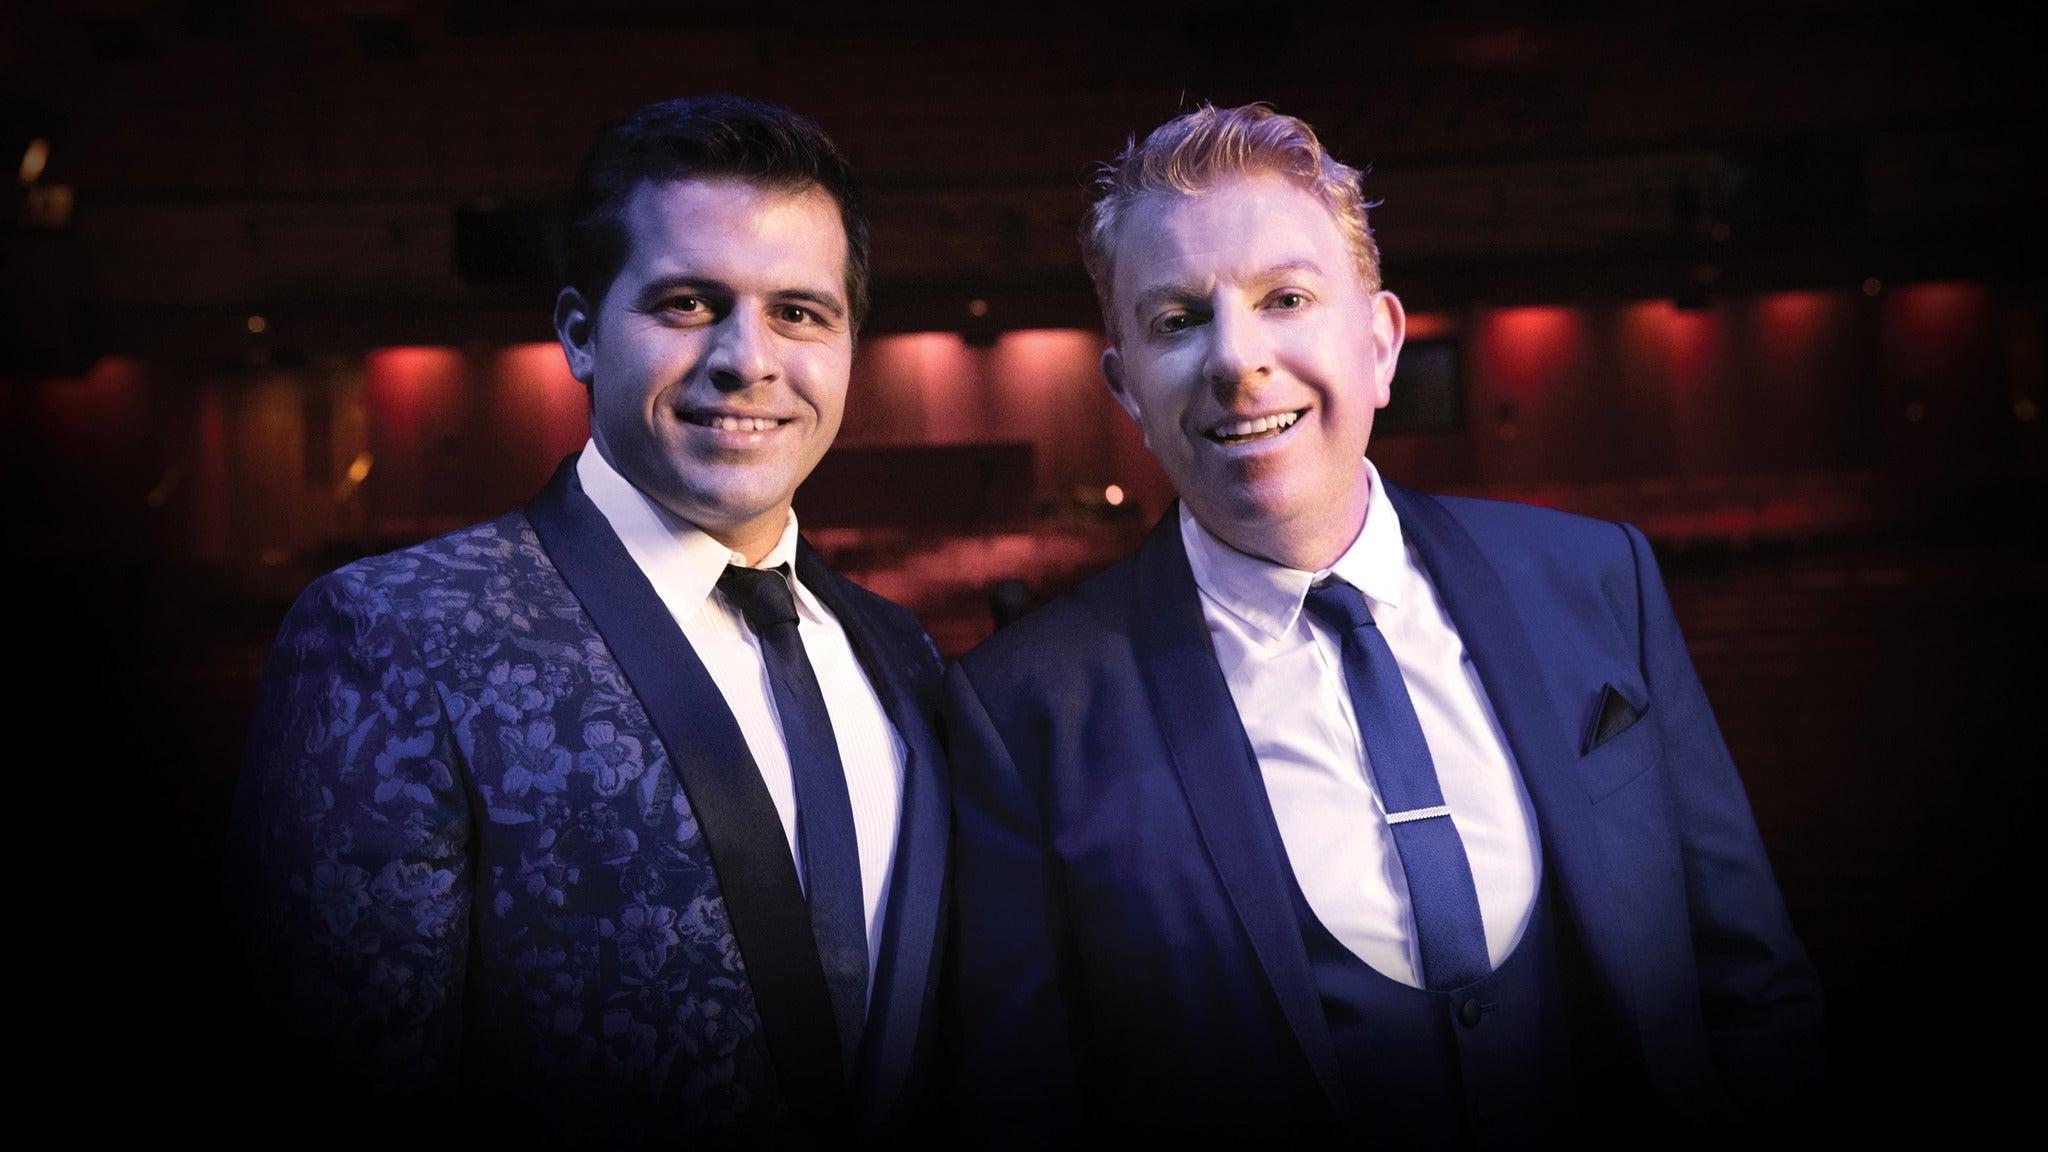 Mark Vincent and Tommy Fleming Together in Concert